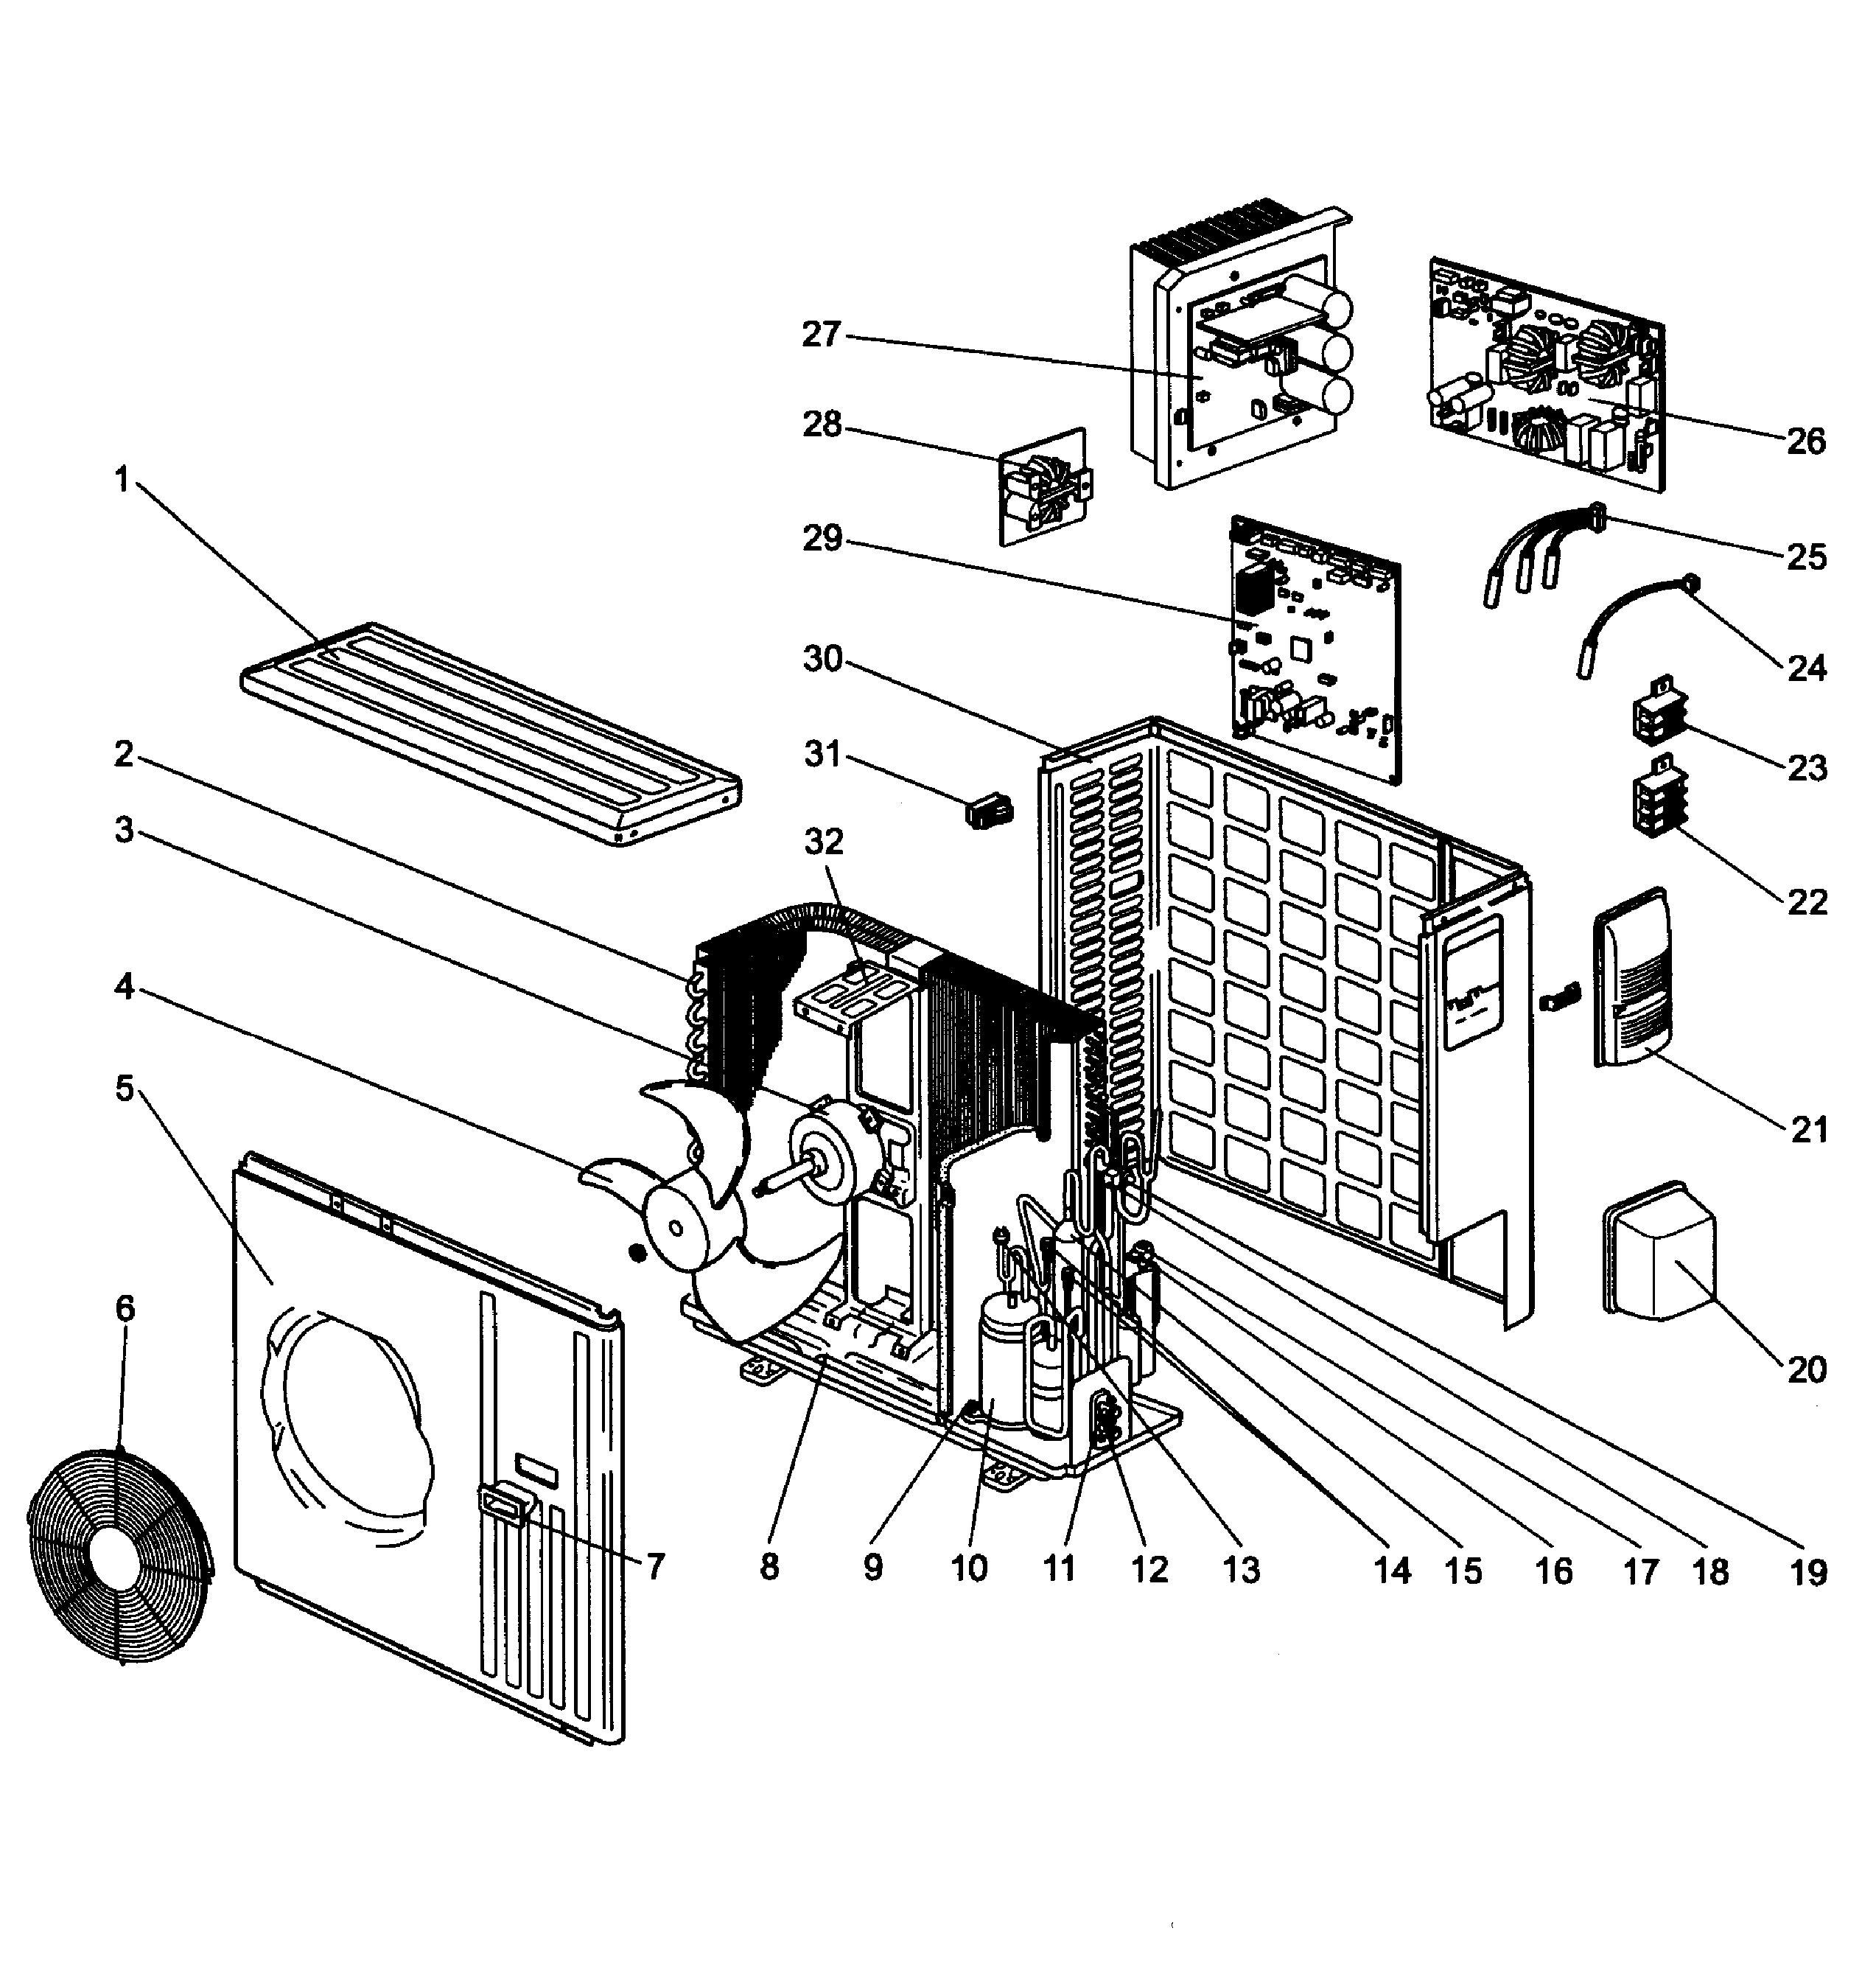 split system air conditioner wiring diagram 12 volt delco alternator mitsubishi a c heat pump parts model